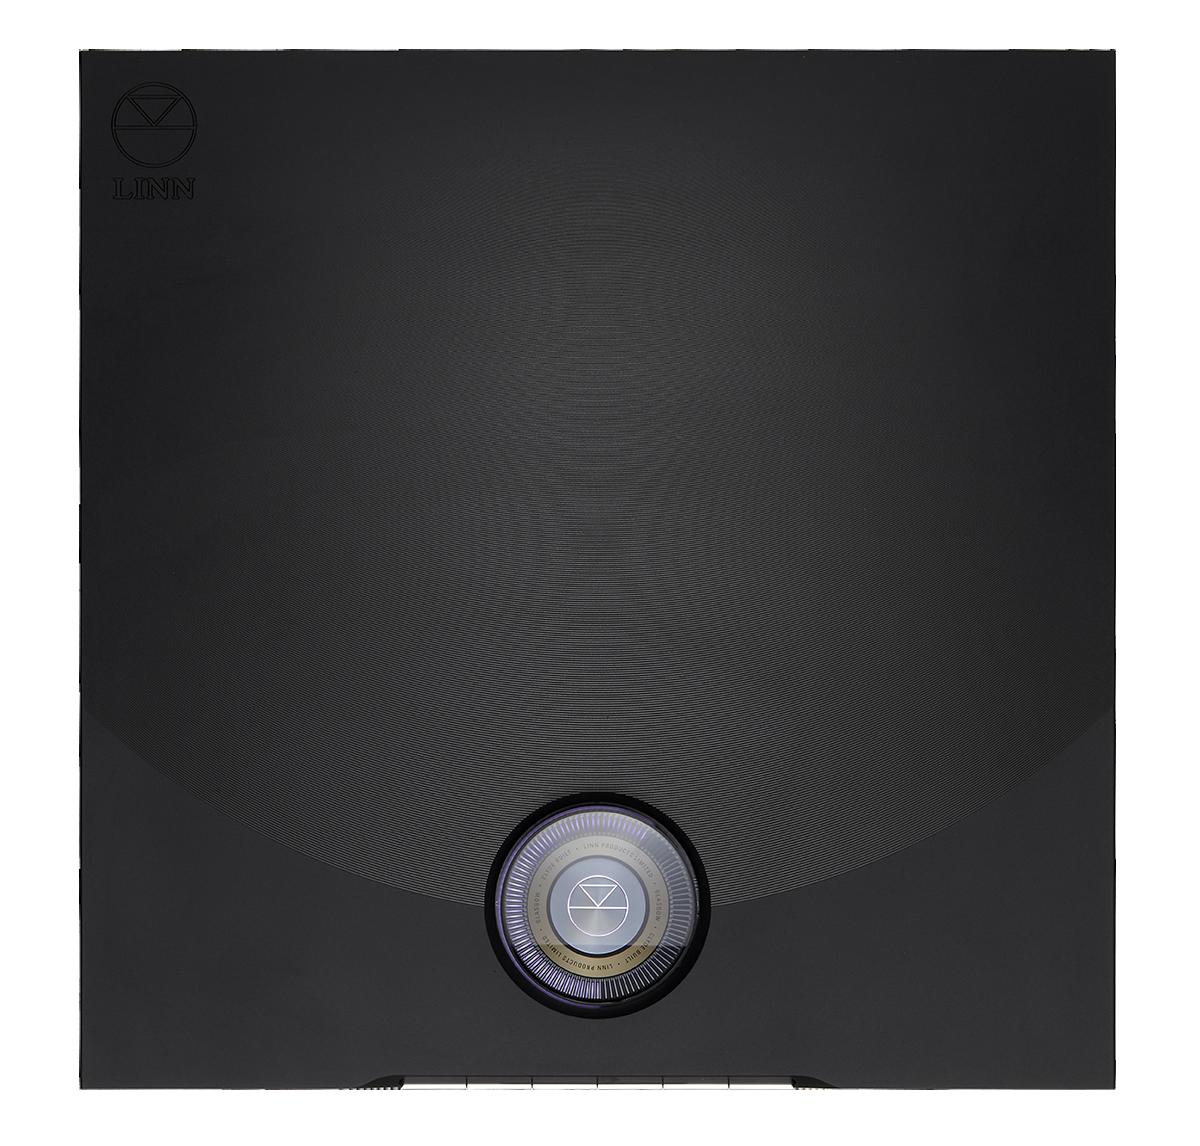 klimax_dsm_2021_black_topdown_web-res